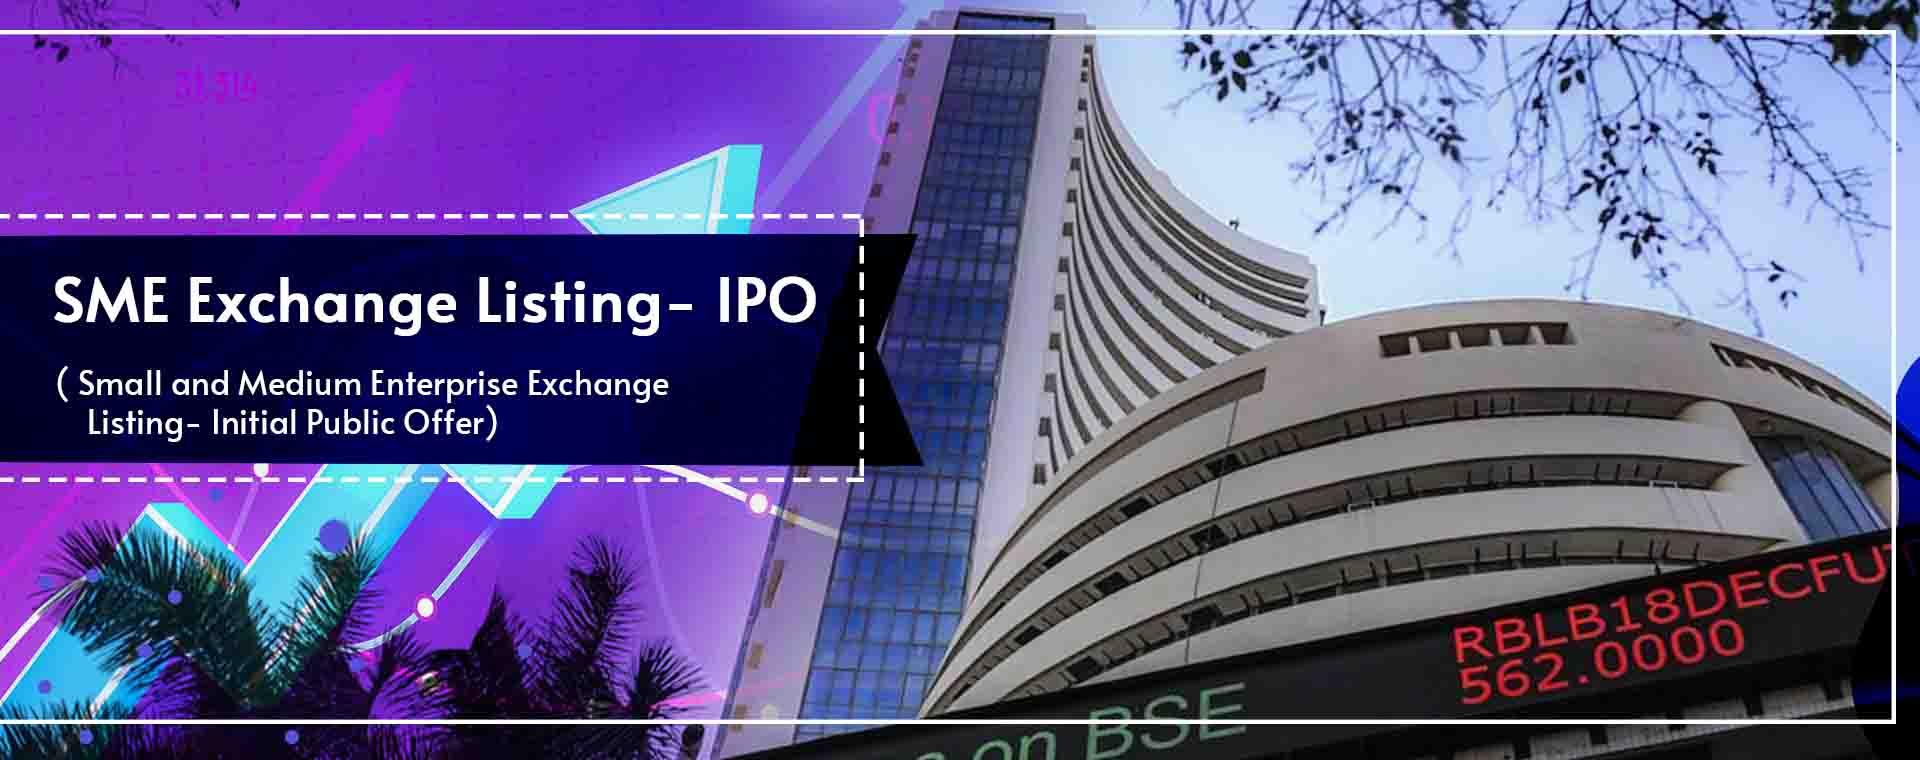 SME Exchange Listing- IPO